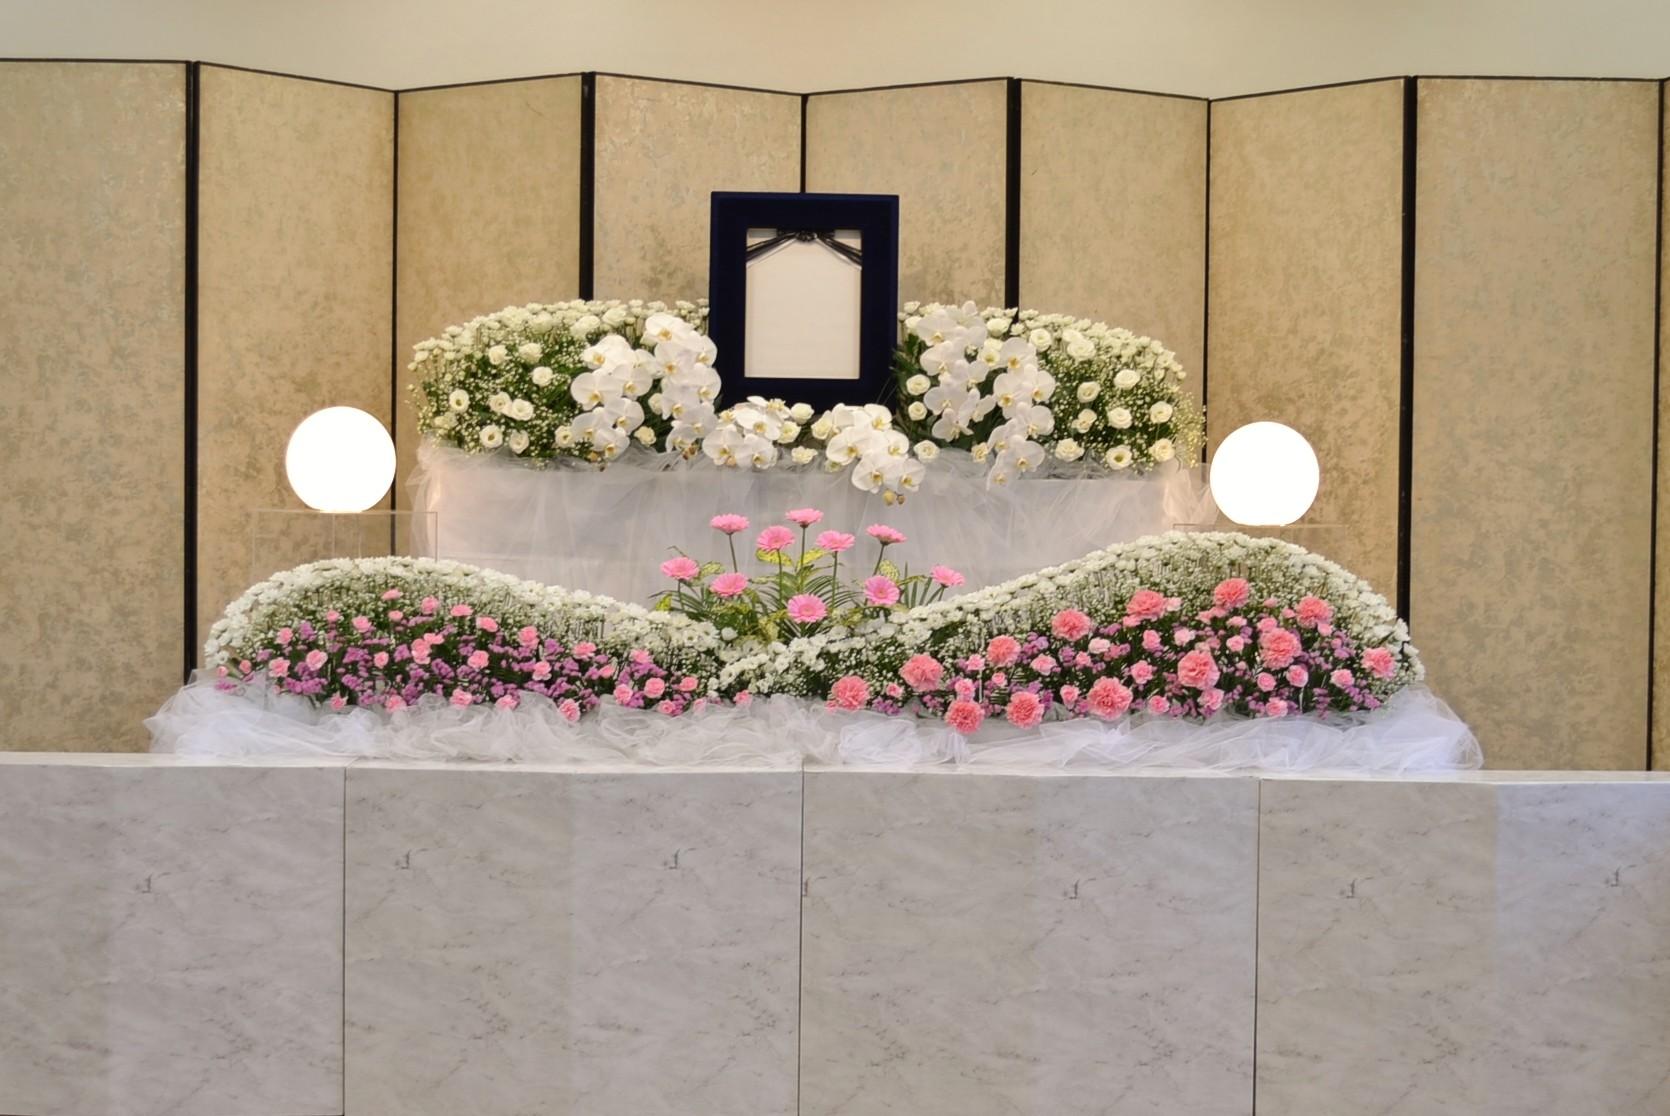 優美な花祭壇